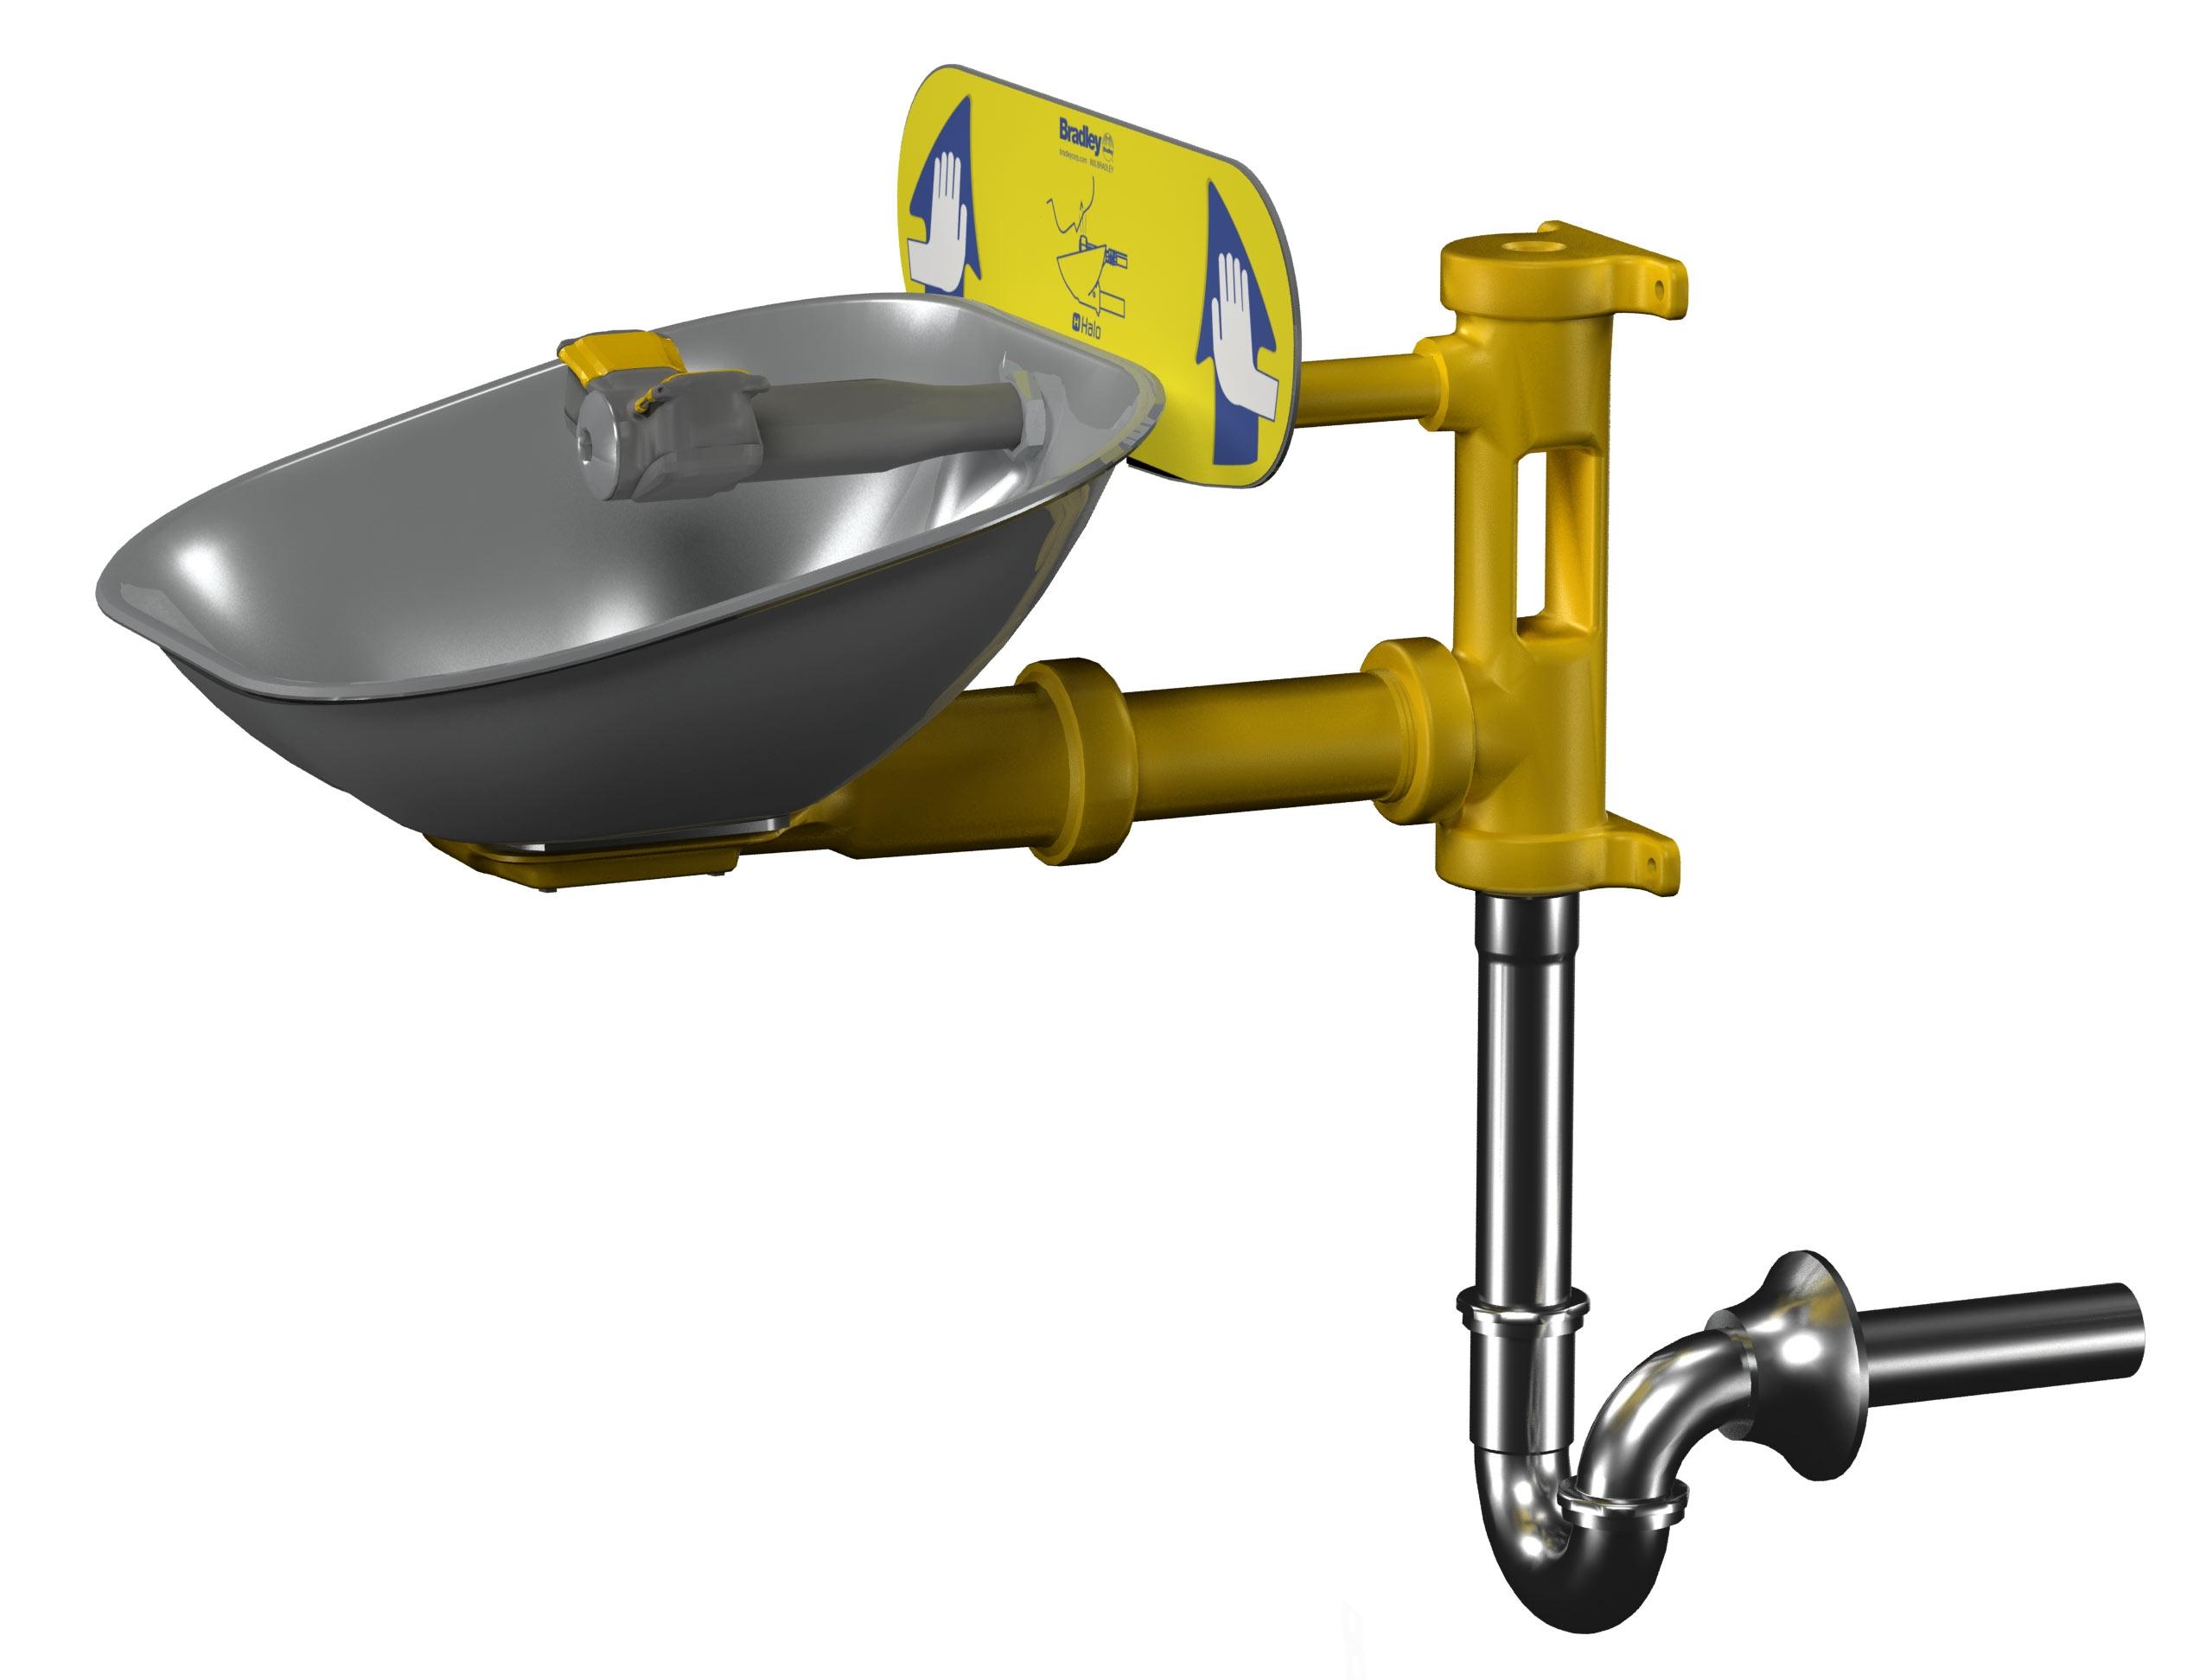 Ideas, bradley faucet mount eyewash station bradley faucet mount eyewash station eyewash stainless steel bowl tailpiece p trap bradley 2552 x 1944  .